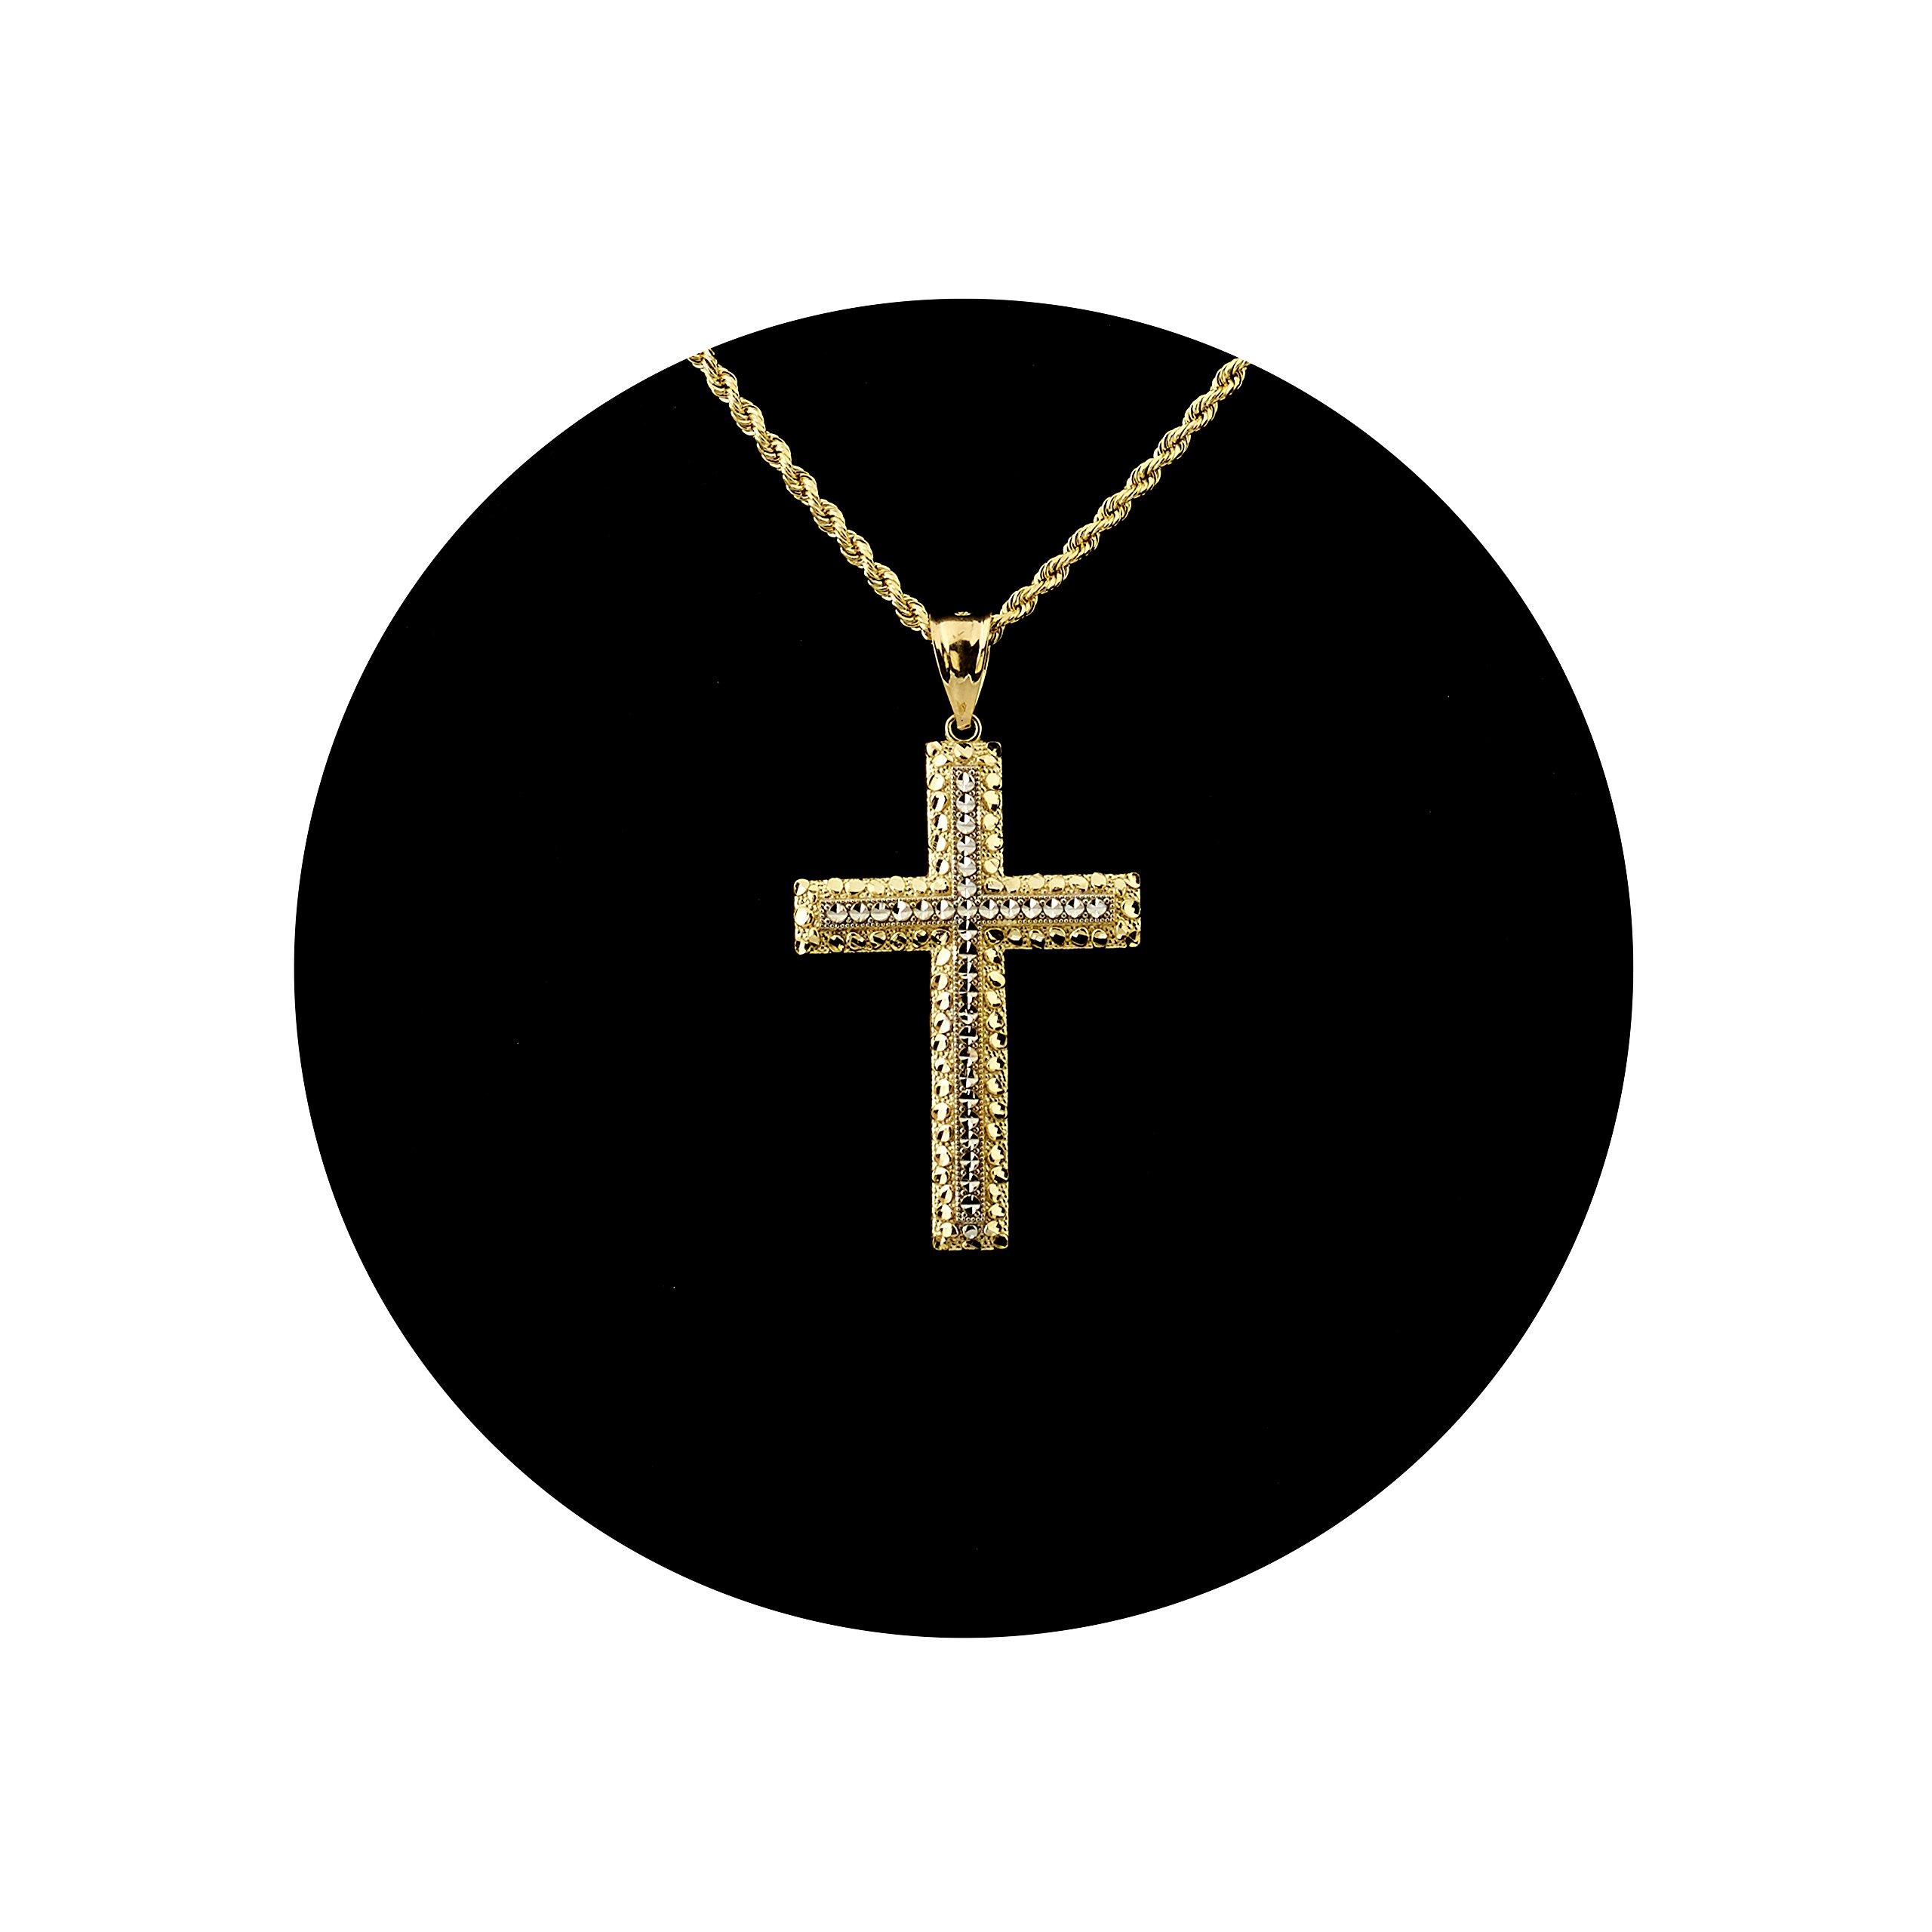 LoveBling 10K Yellow Gold Two Toned Diamond Cut Cross Charm Pendant (1.95'' x 1.05'')